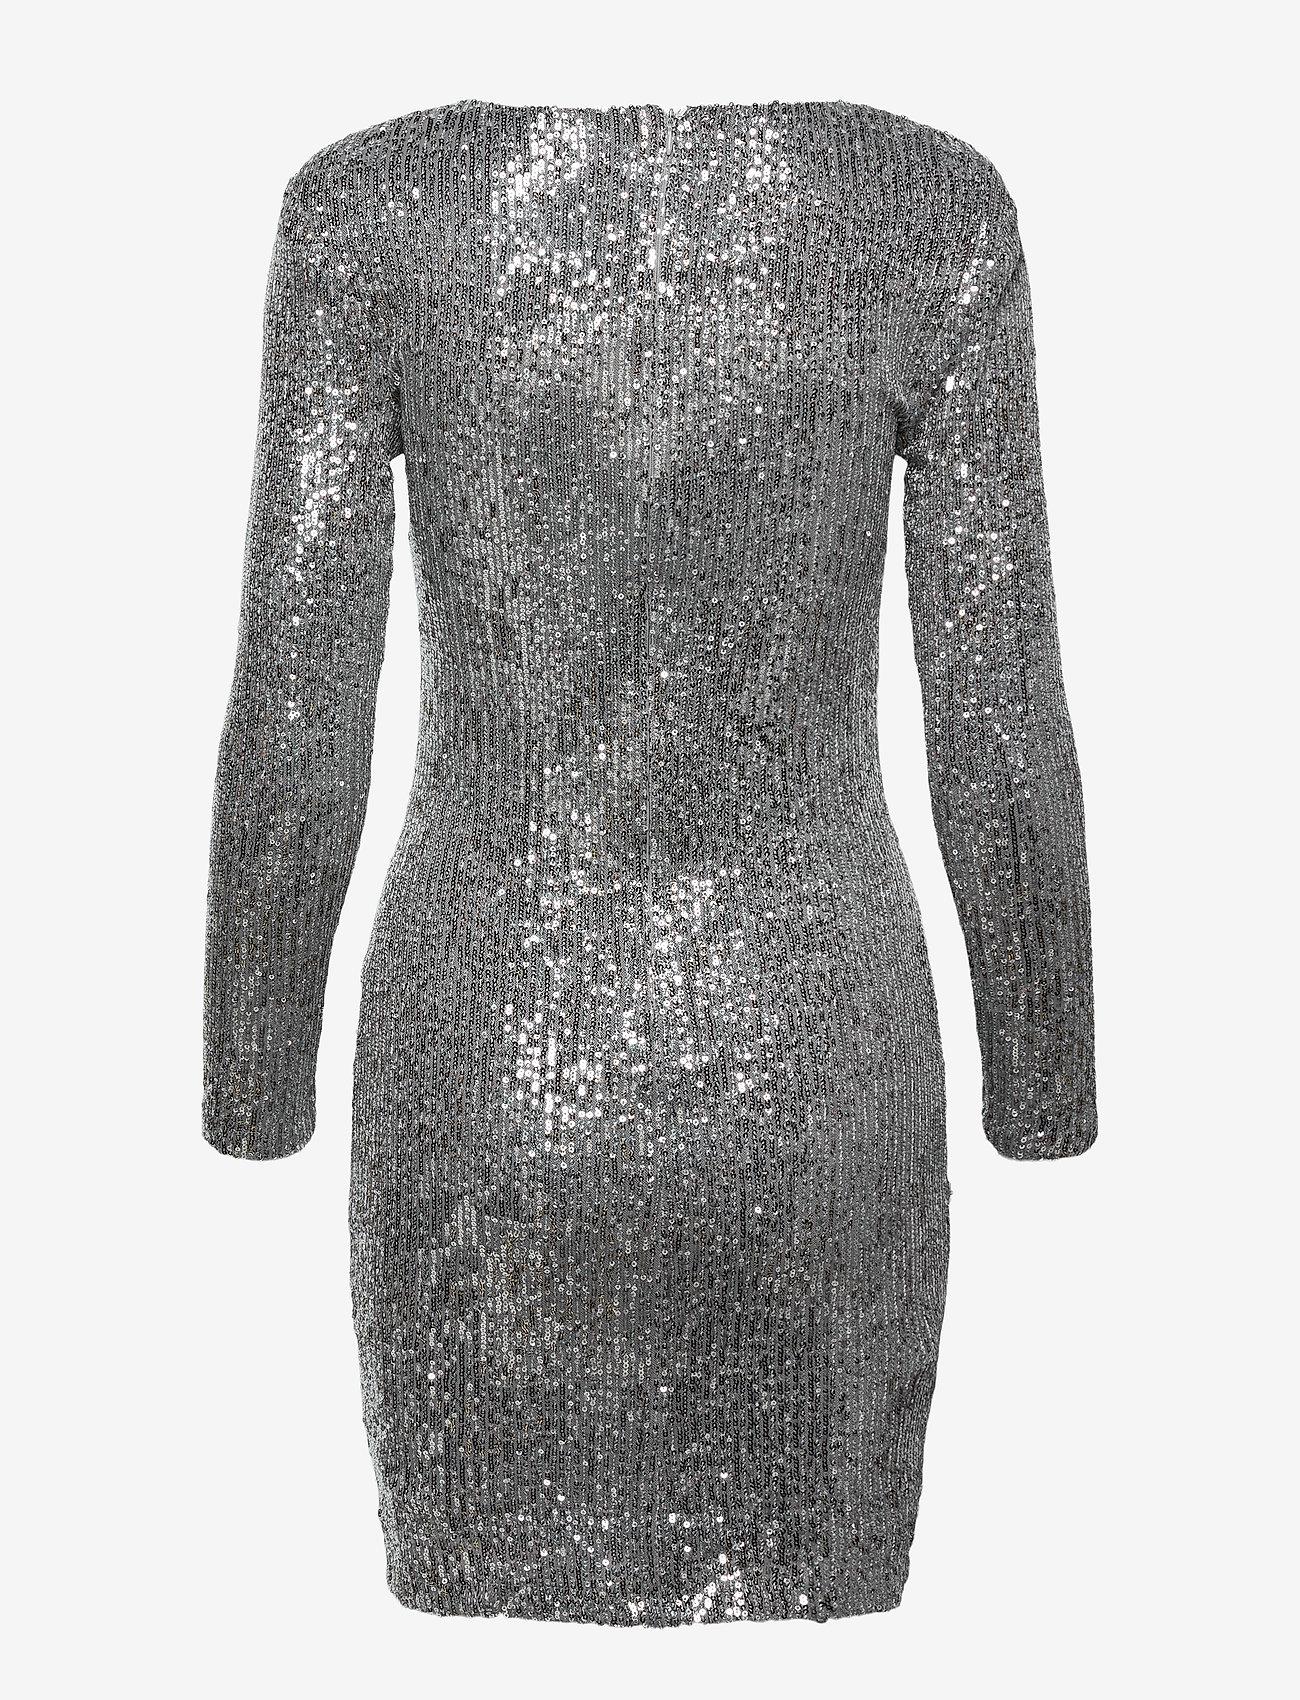 Mango - LENJUELA - cocktail-kjoler - silver - 1